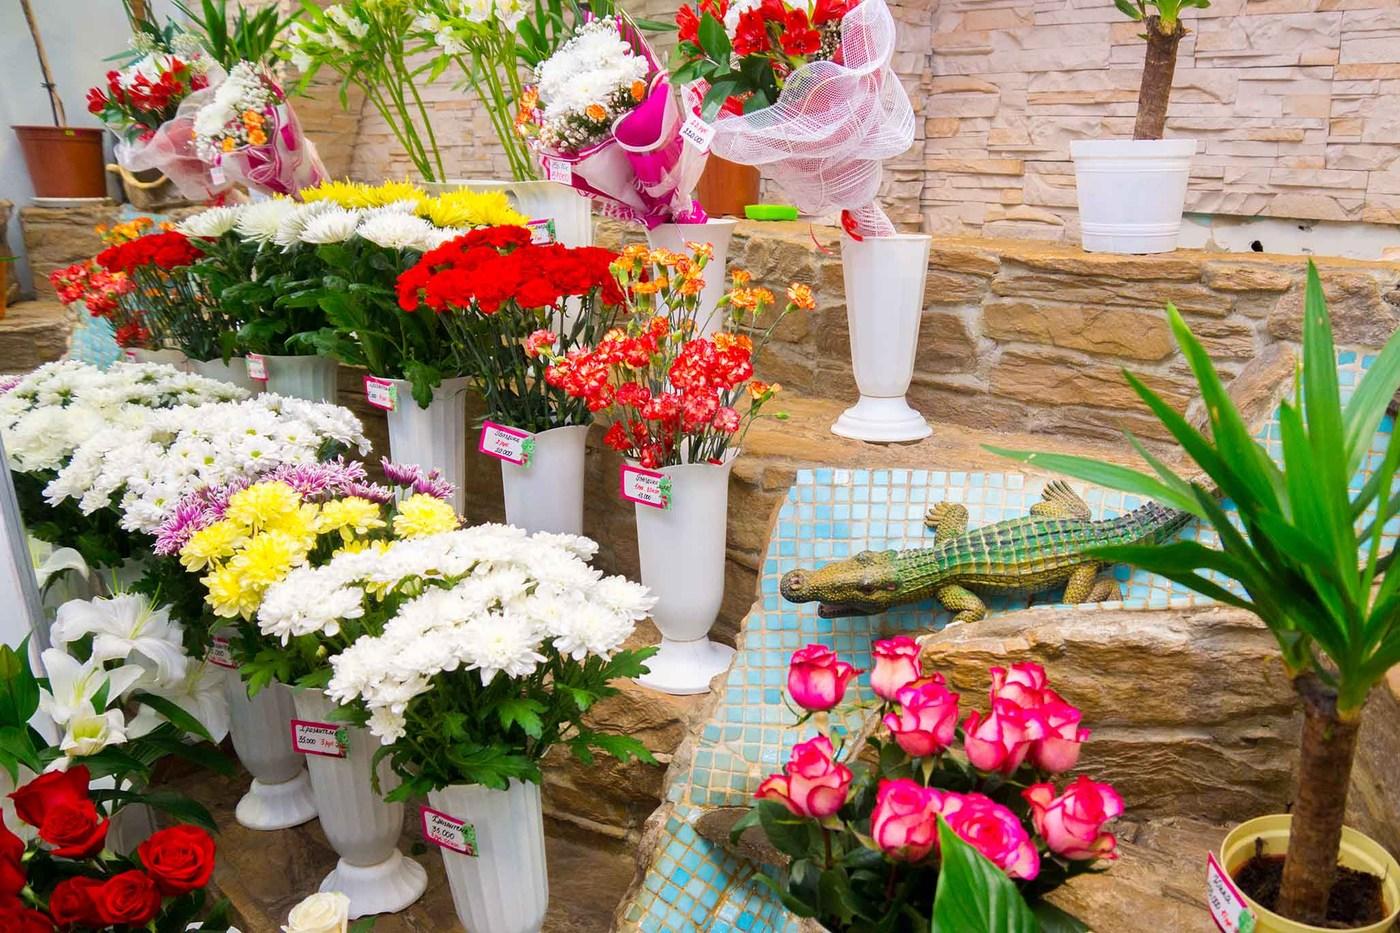 Доставка цветов подарков в витебске